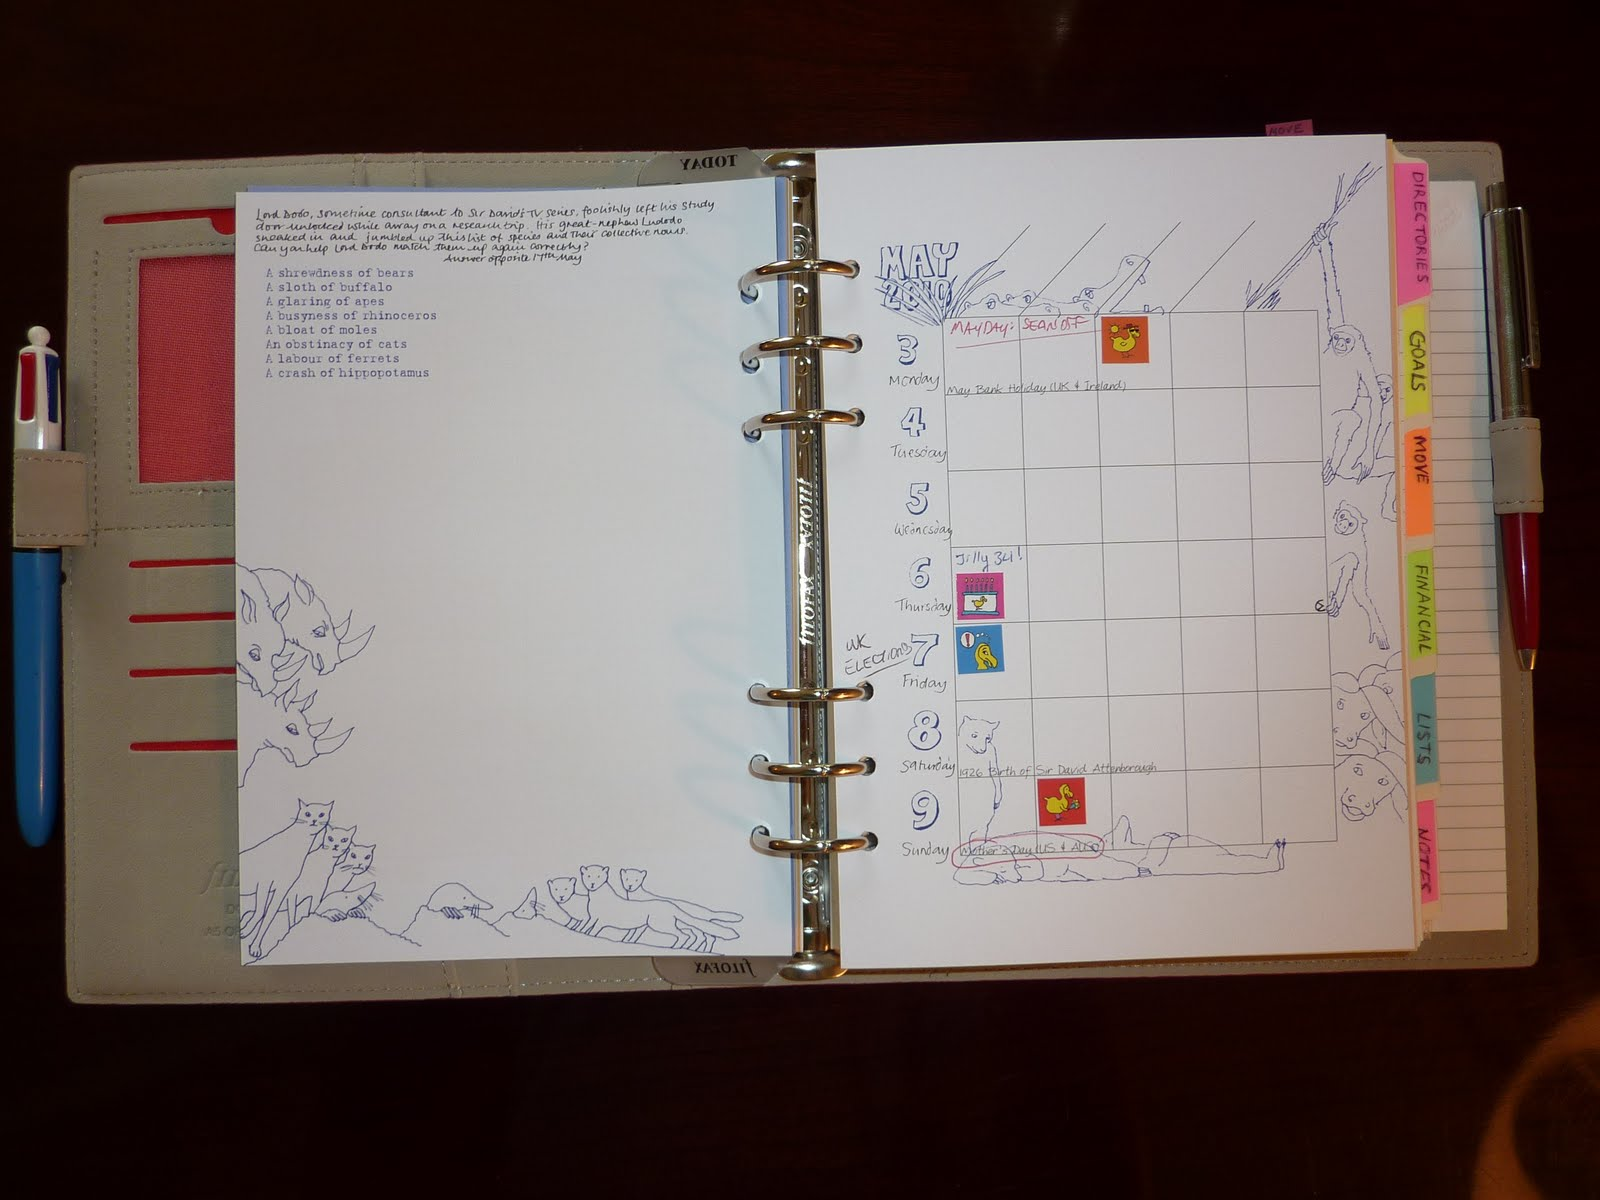 Philofaxy Diary Inserts